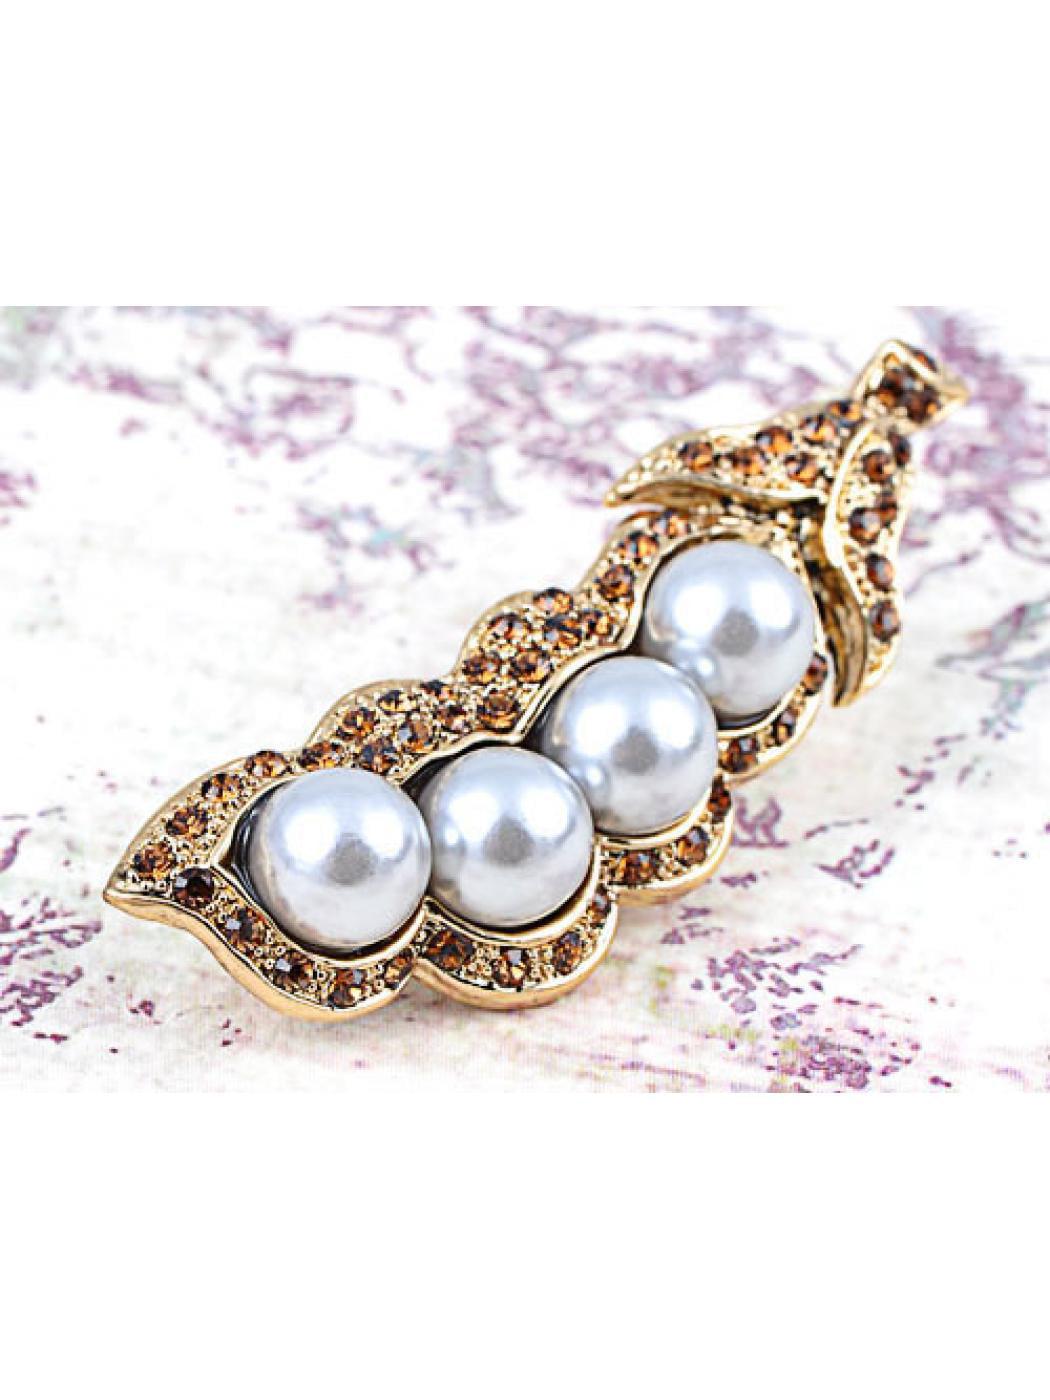 Golden Tone Bronze Topaz Rhinestone Four Faux Pearl Peas in a Pod Fashion Brooch by